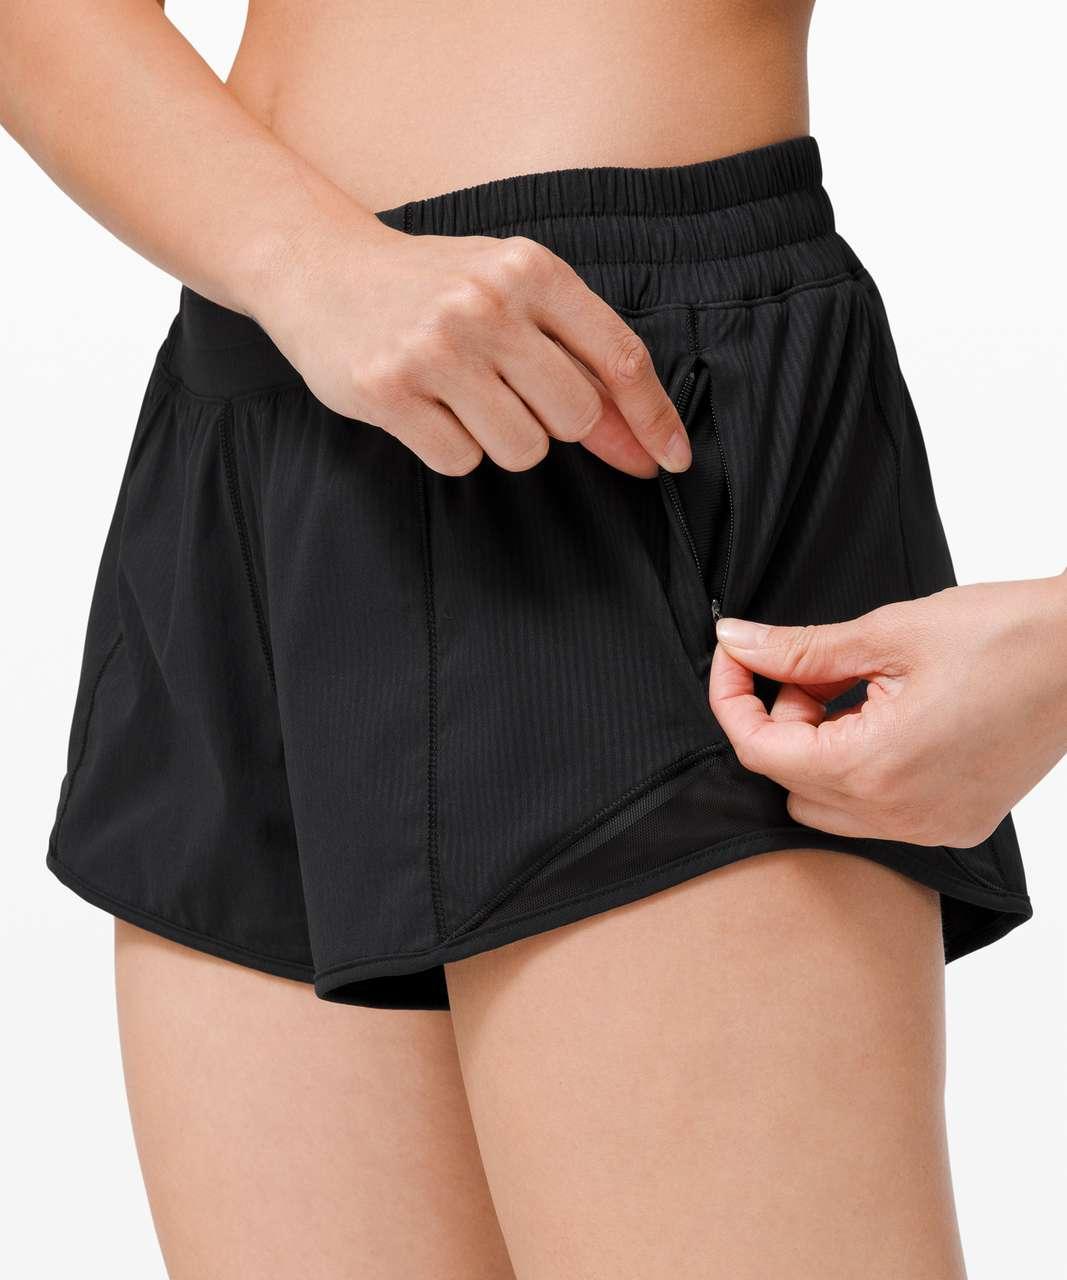 "Lululemon Hotty Hot Short II *2.5"" - Black"